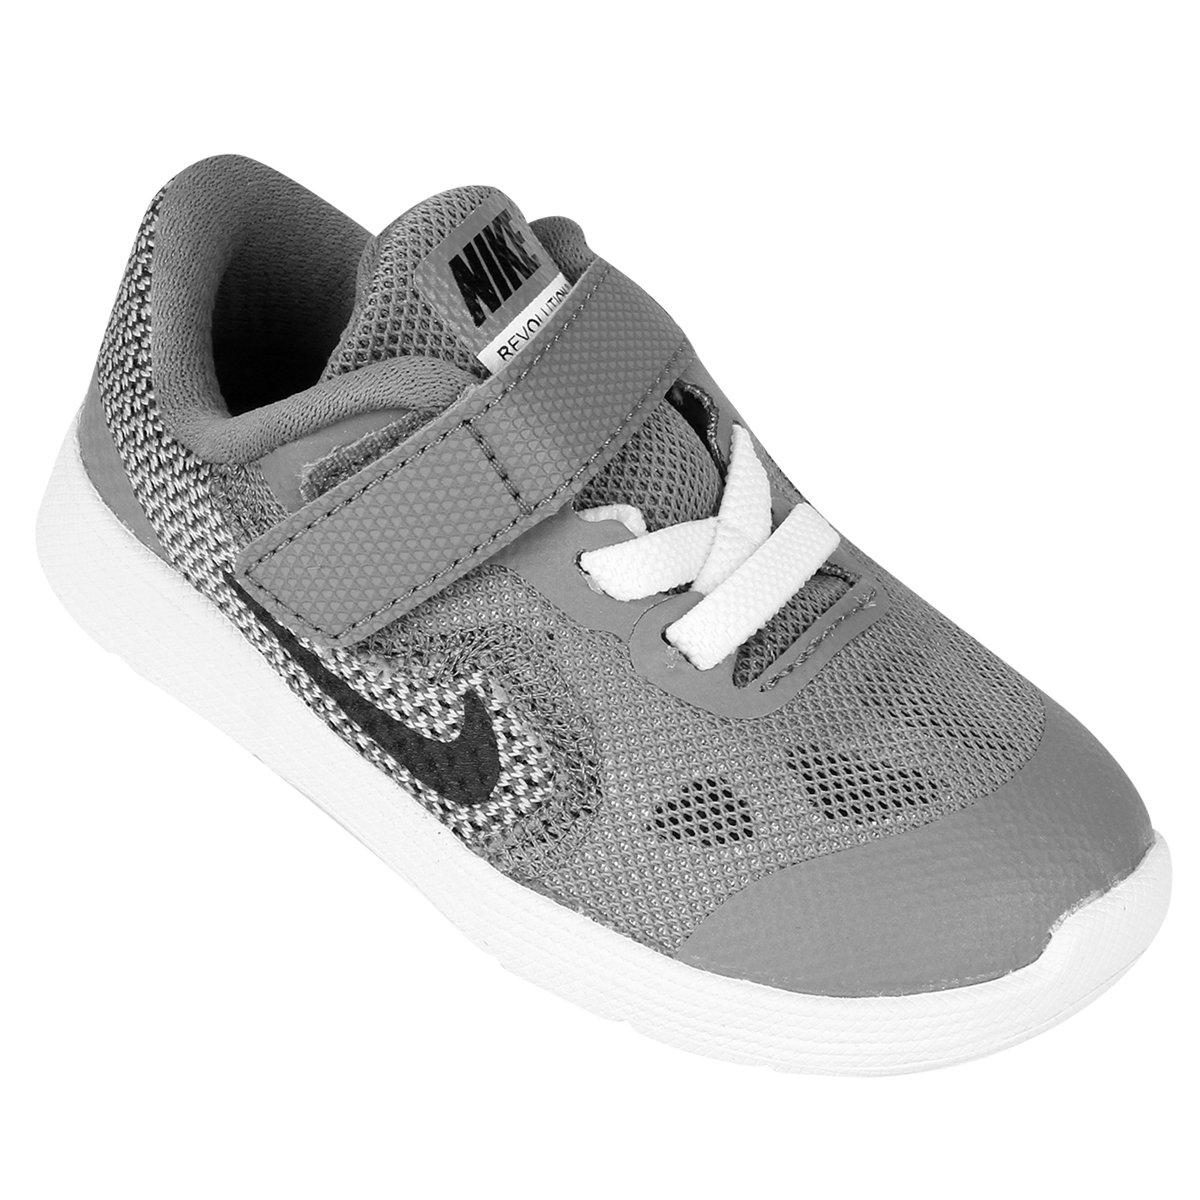 956e1a48fc Tênis Infantil Nike Revolution 3 - Cinza e Branco